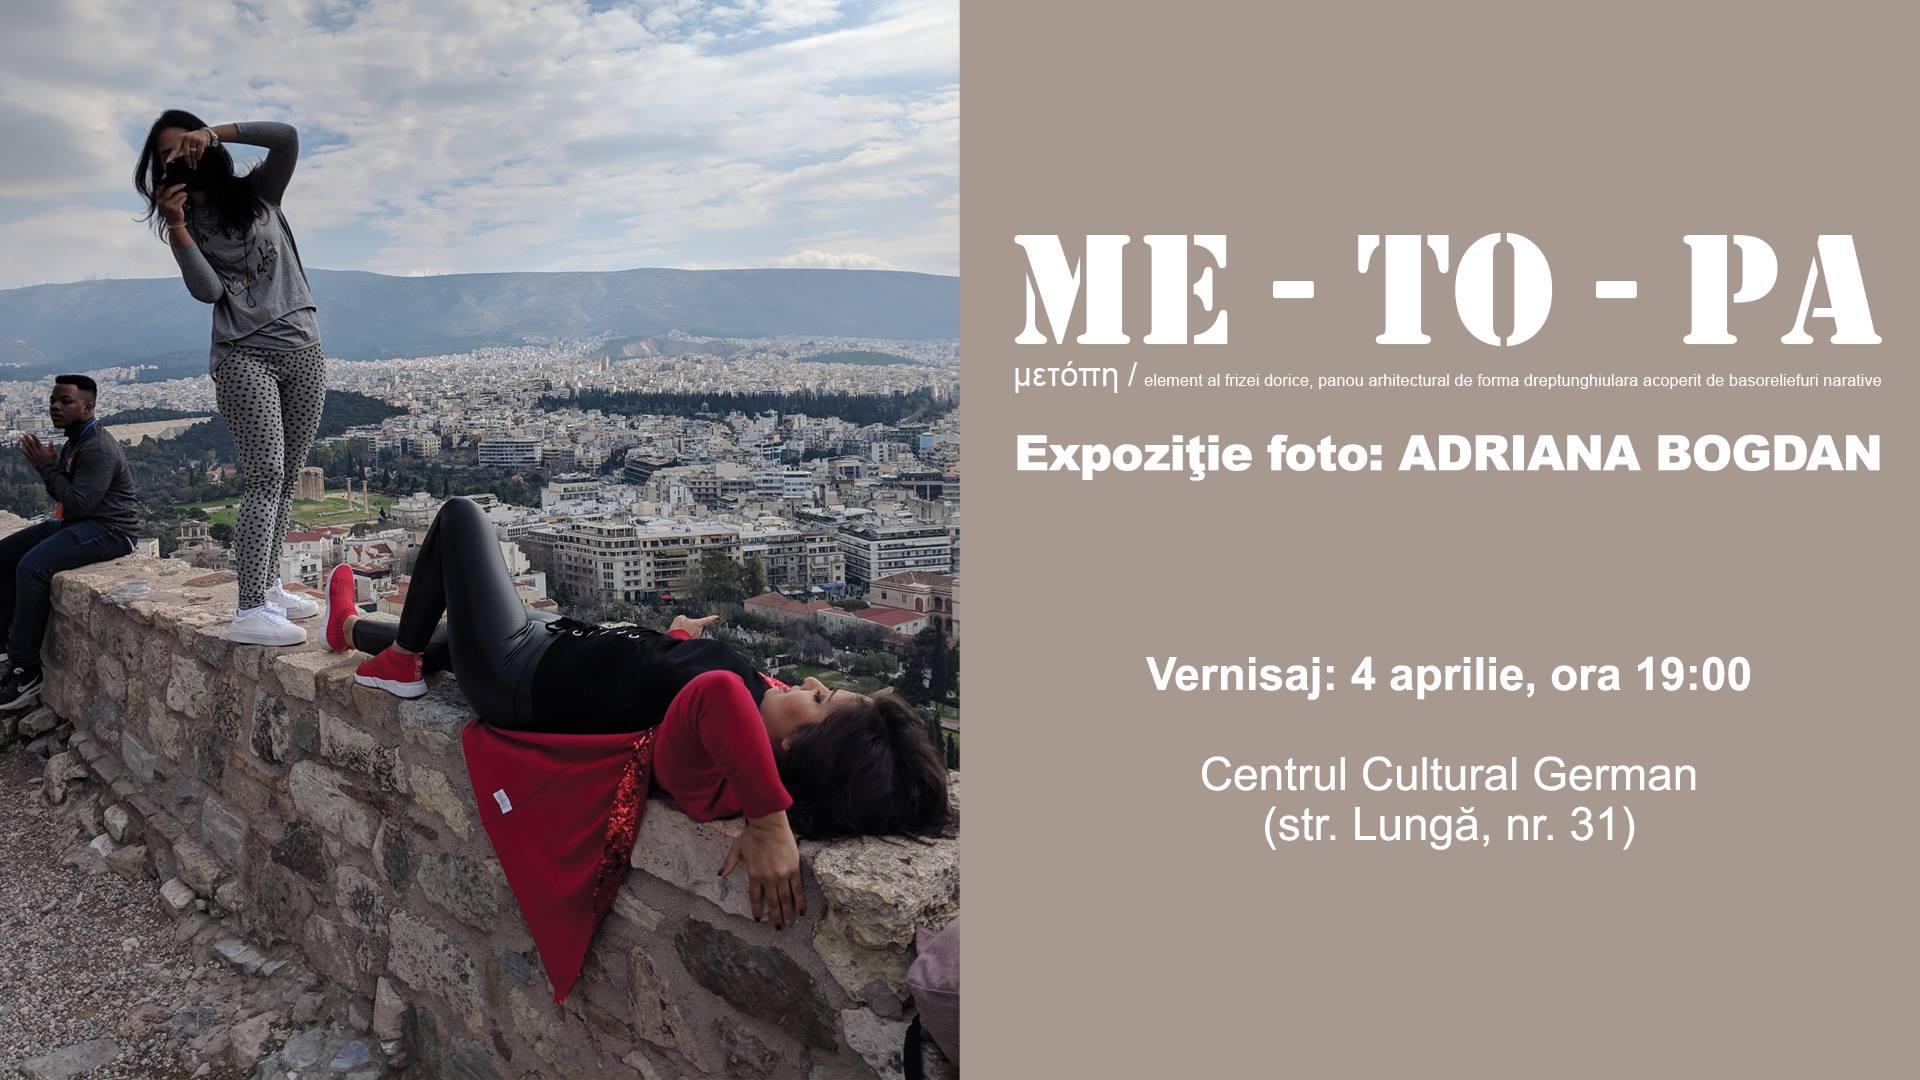 Metopa - Adriana Bogdan